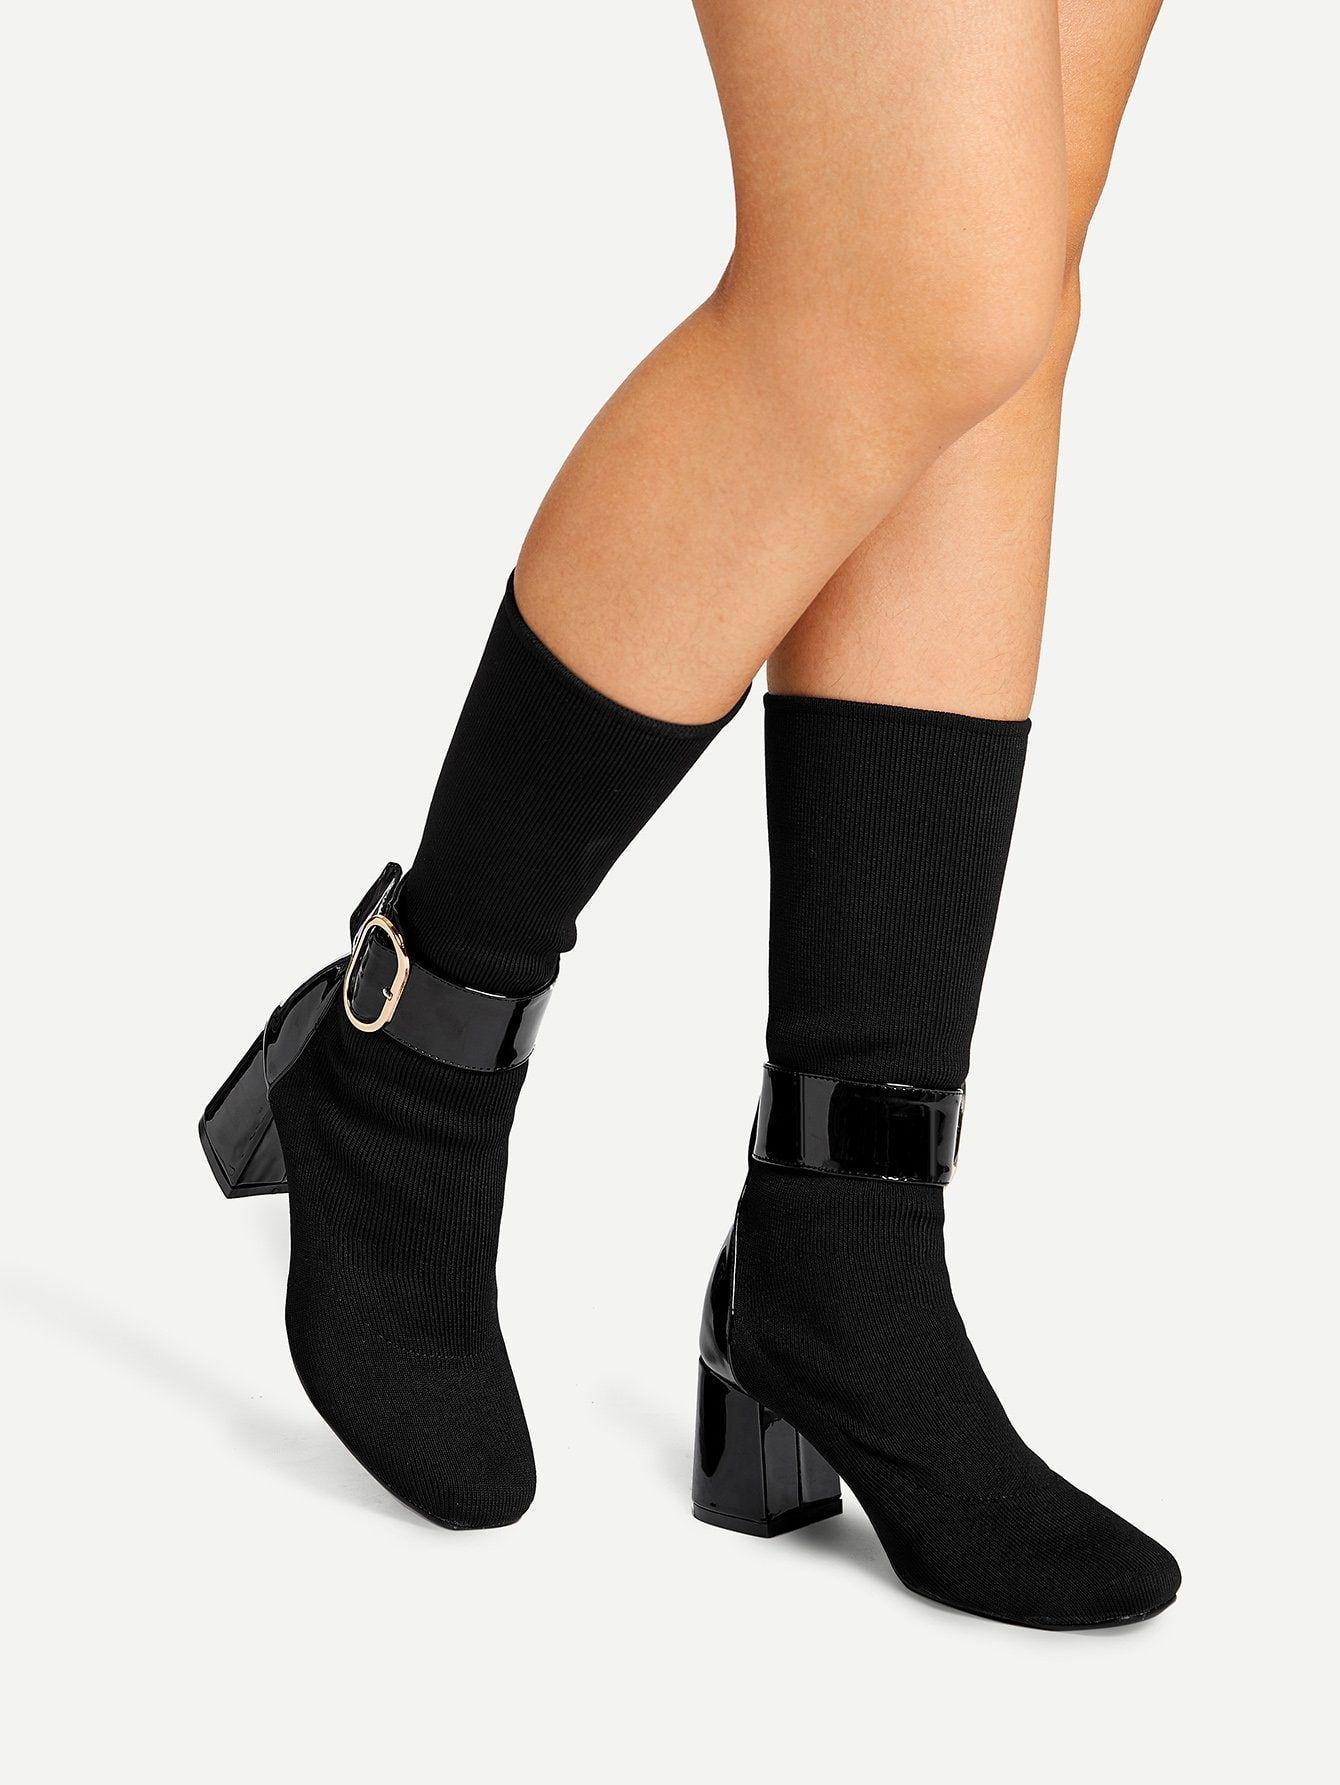 da82ea41cee9 Casual Almond Toe Mid Calf No zipper Black Low Heel Chunky Ankle Buckle Sock  Boots